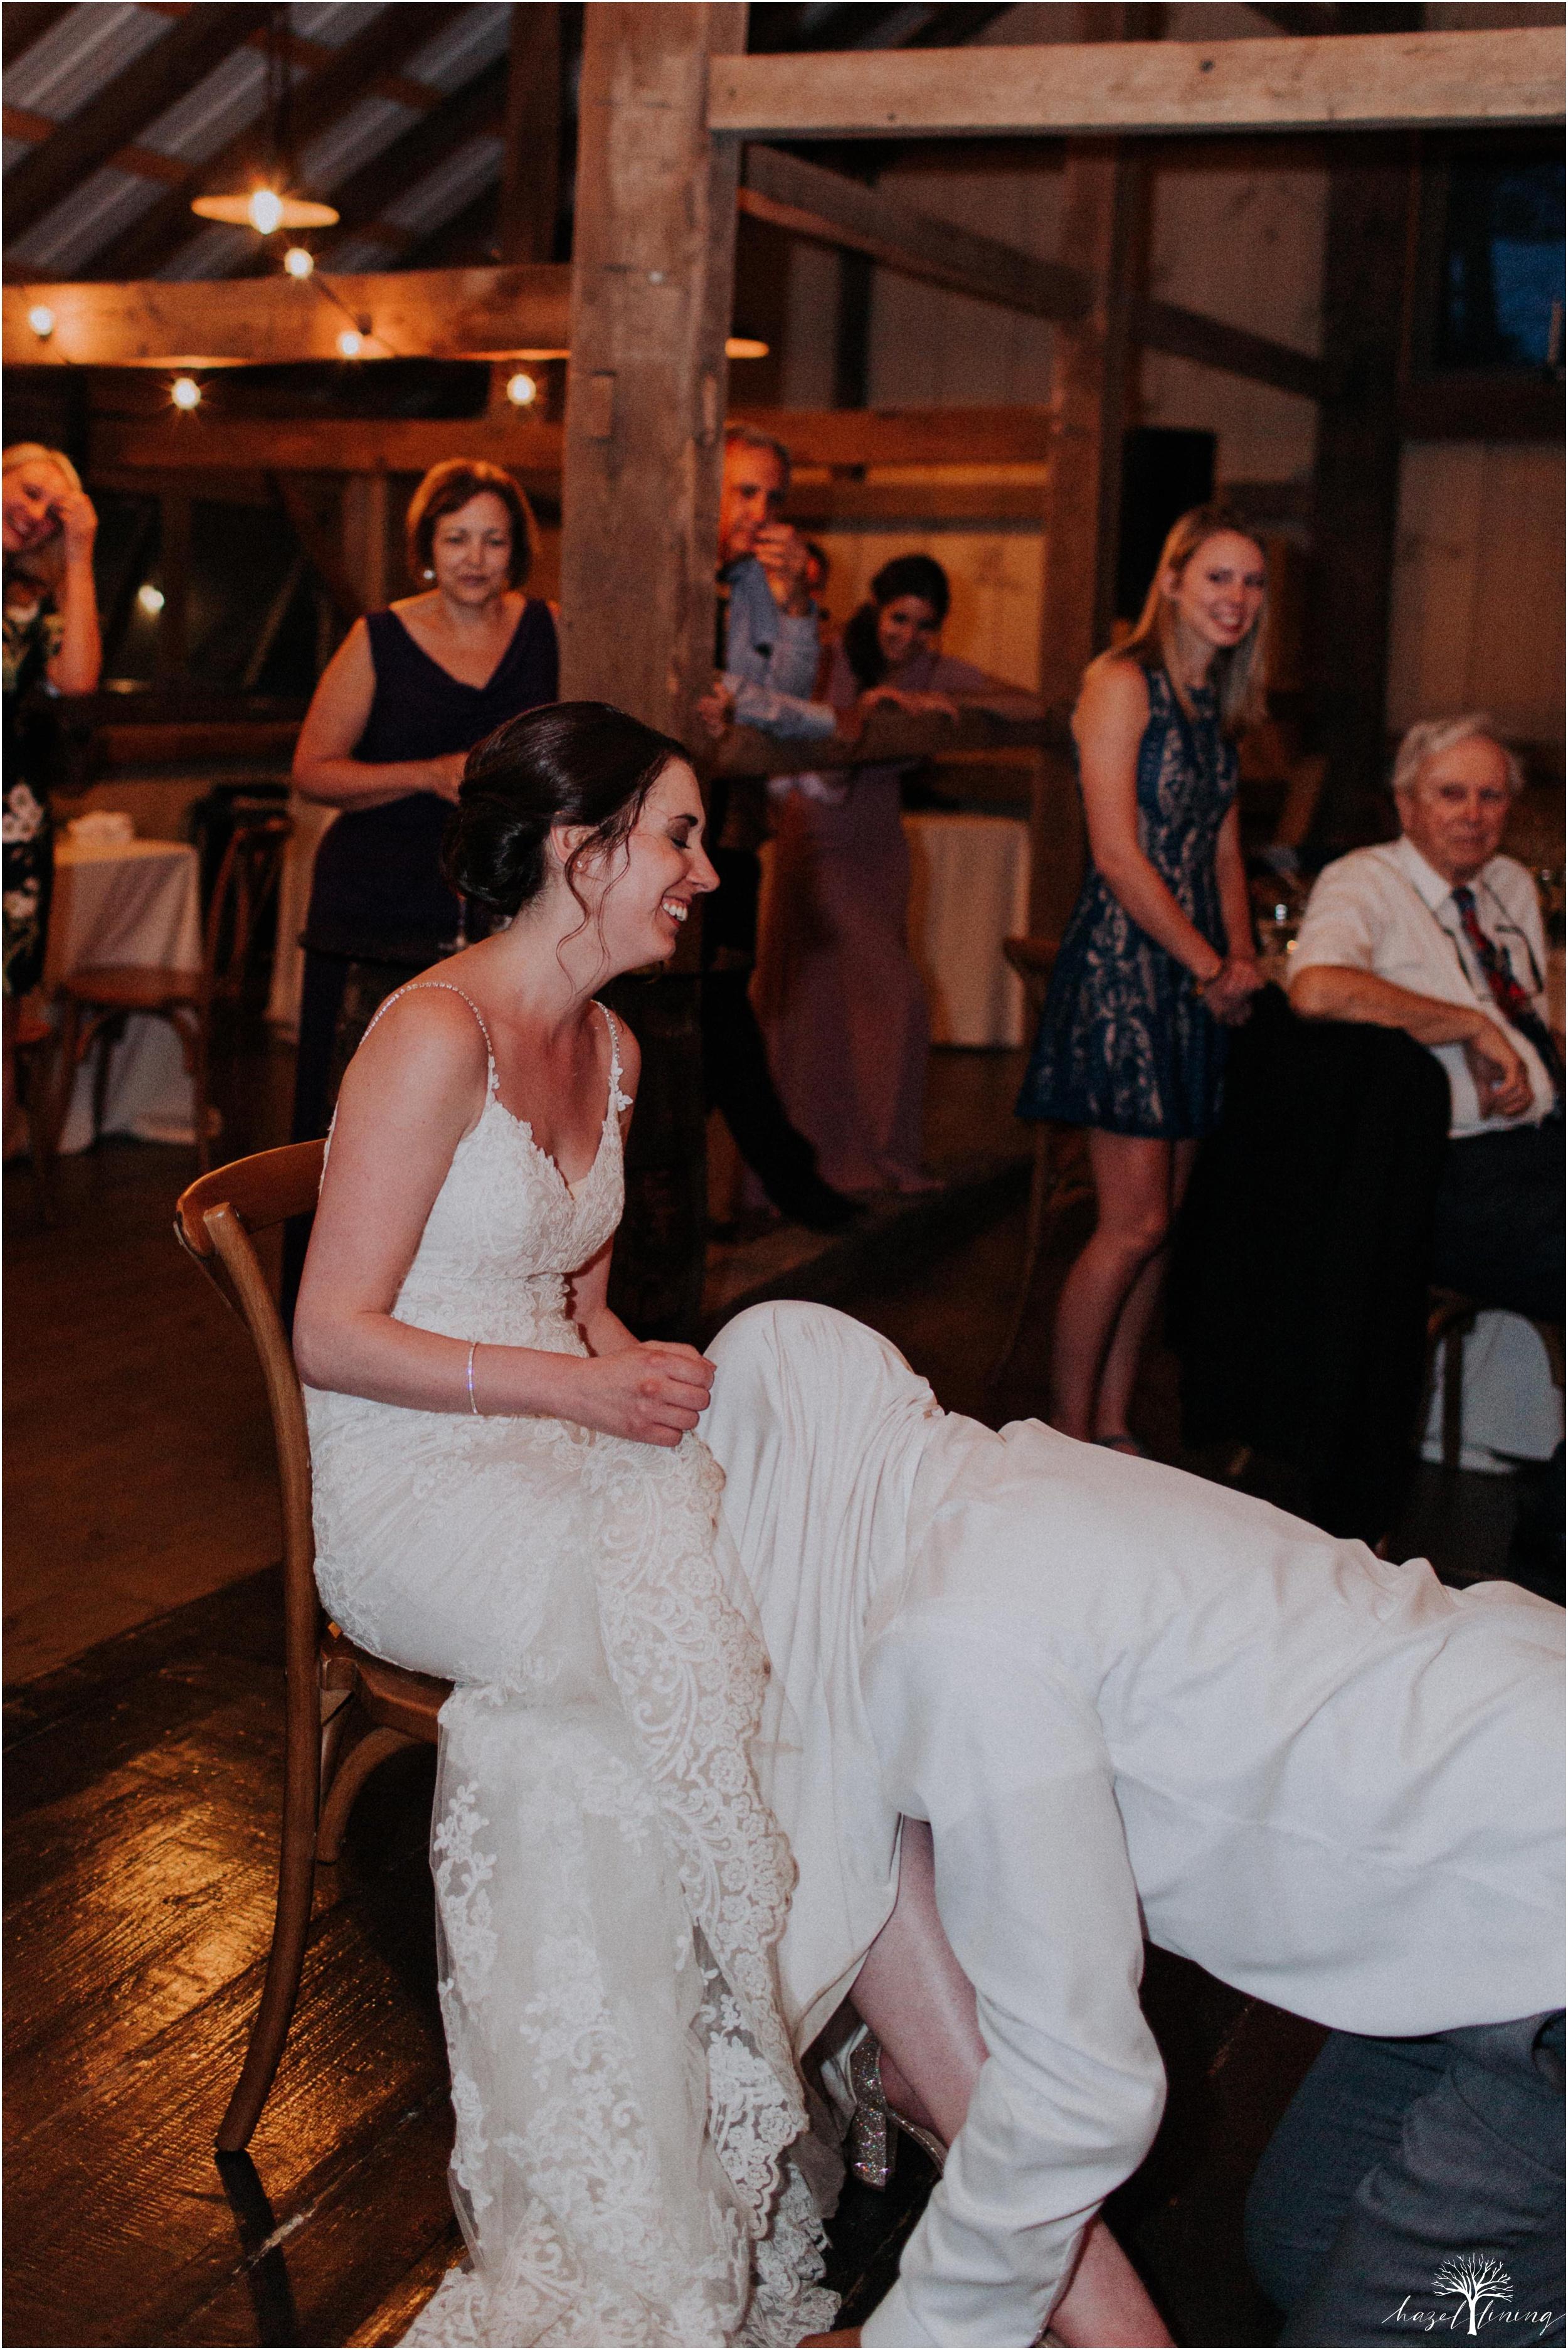 hazel-lining-travel-wedding-elopement-photography-lisa-landon-shoemaker-the-farm-bakery-and-events-bucks-county-quakertown-pennsylvania-summer-country-outdoor-farm-wedding_0167.jpg